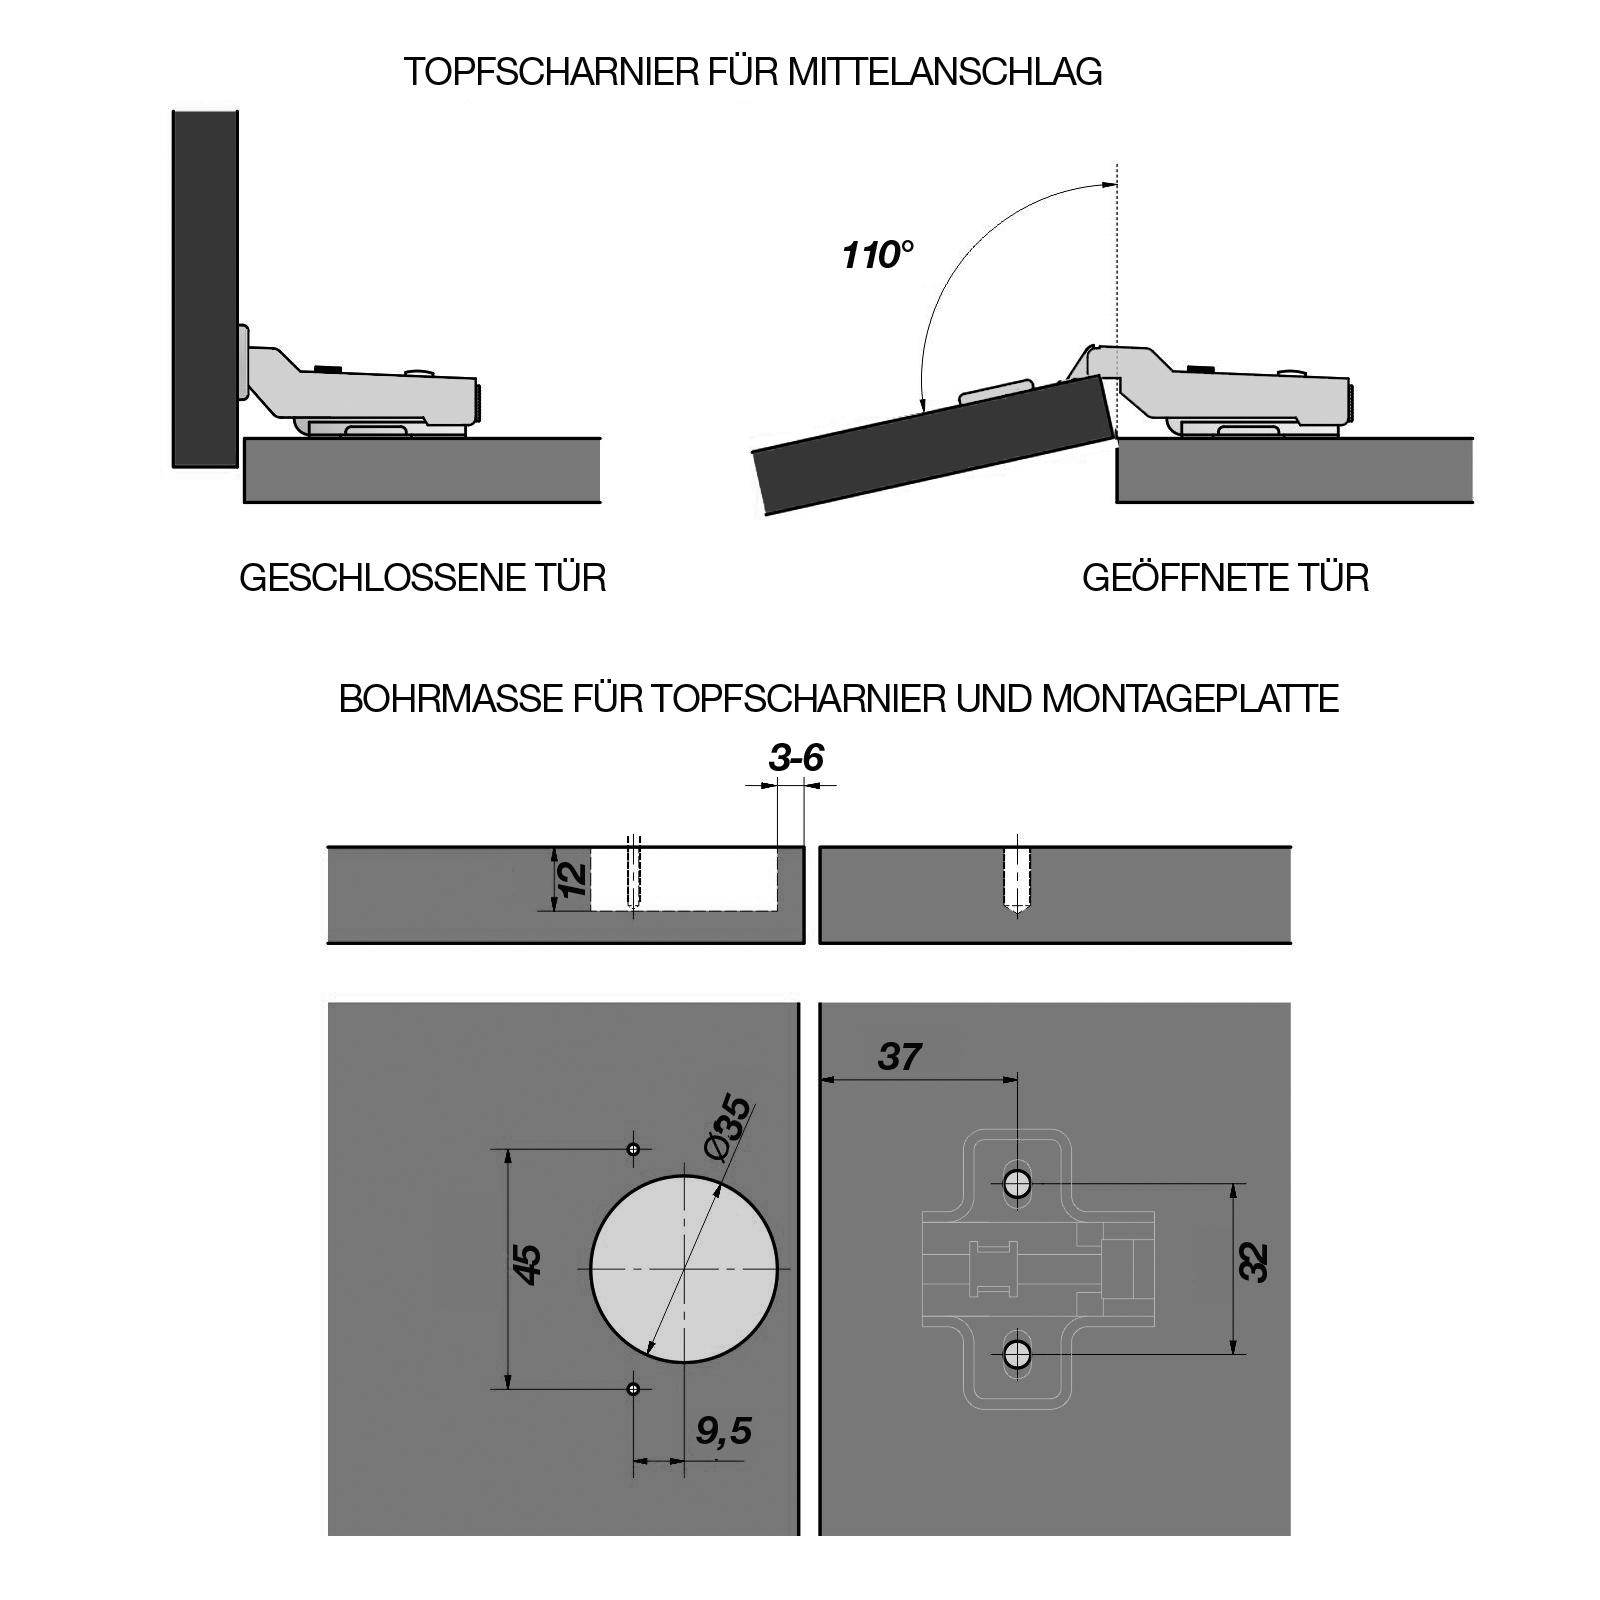 Blum CLIP TOP HINGE Pot Tape Furniture Hinge with Damping eckanschlag 110 °